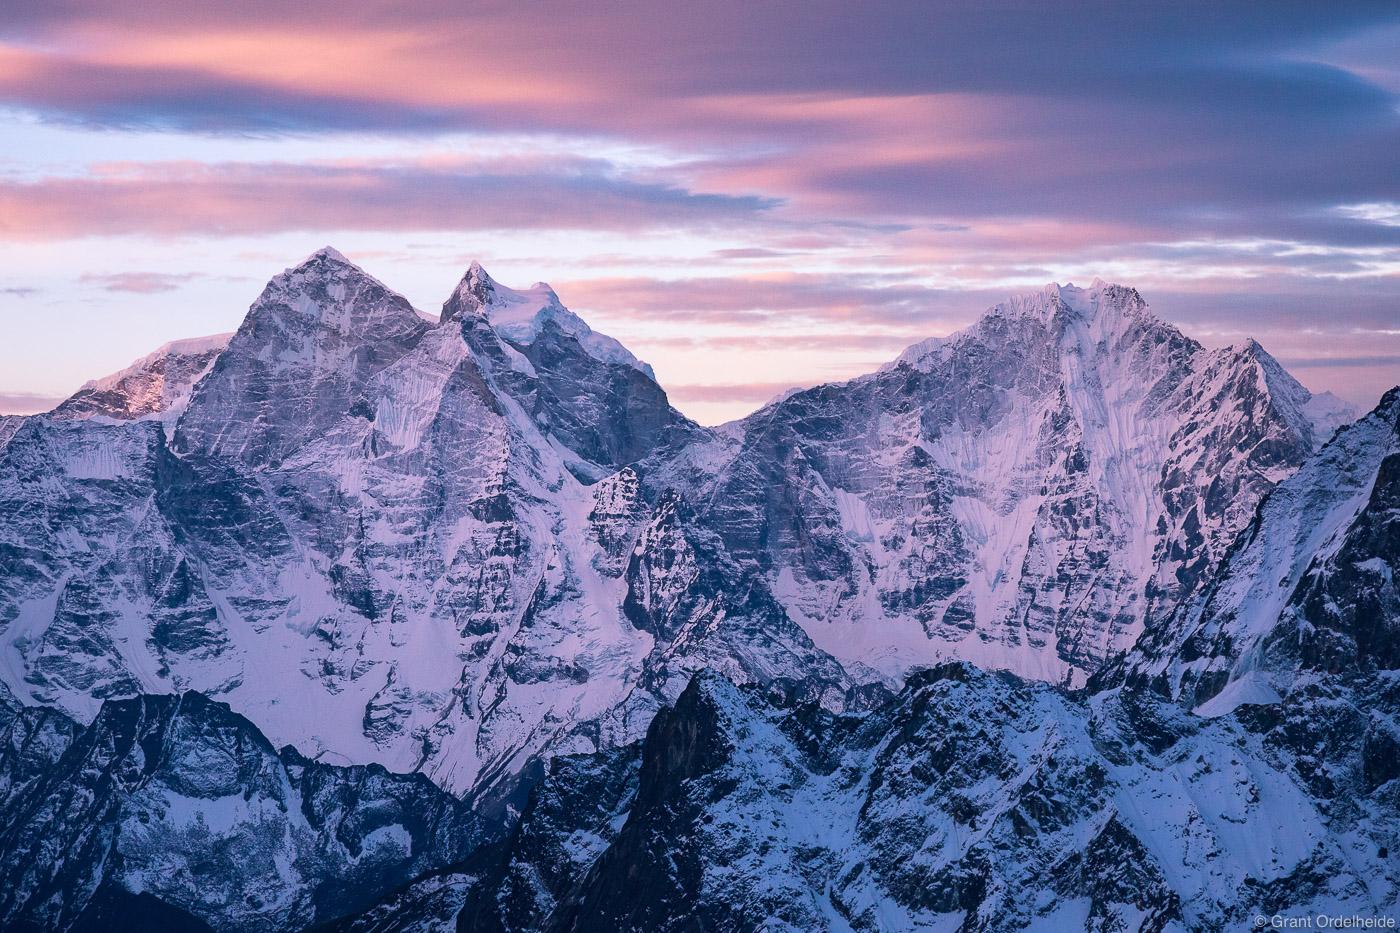 Kangtega and Thamserku as seen from high on Lobuche East at sunrise in the Everest Region of Nepal.